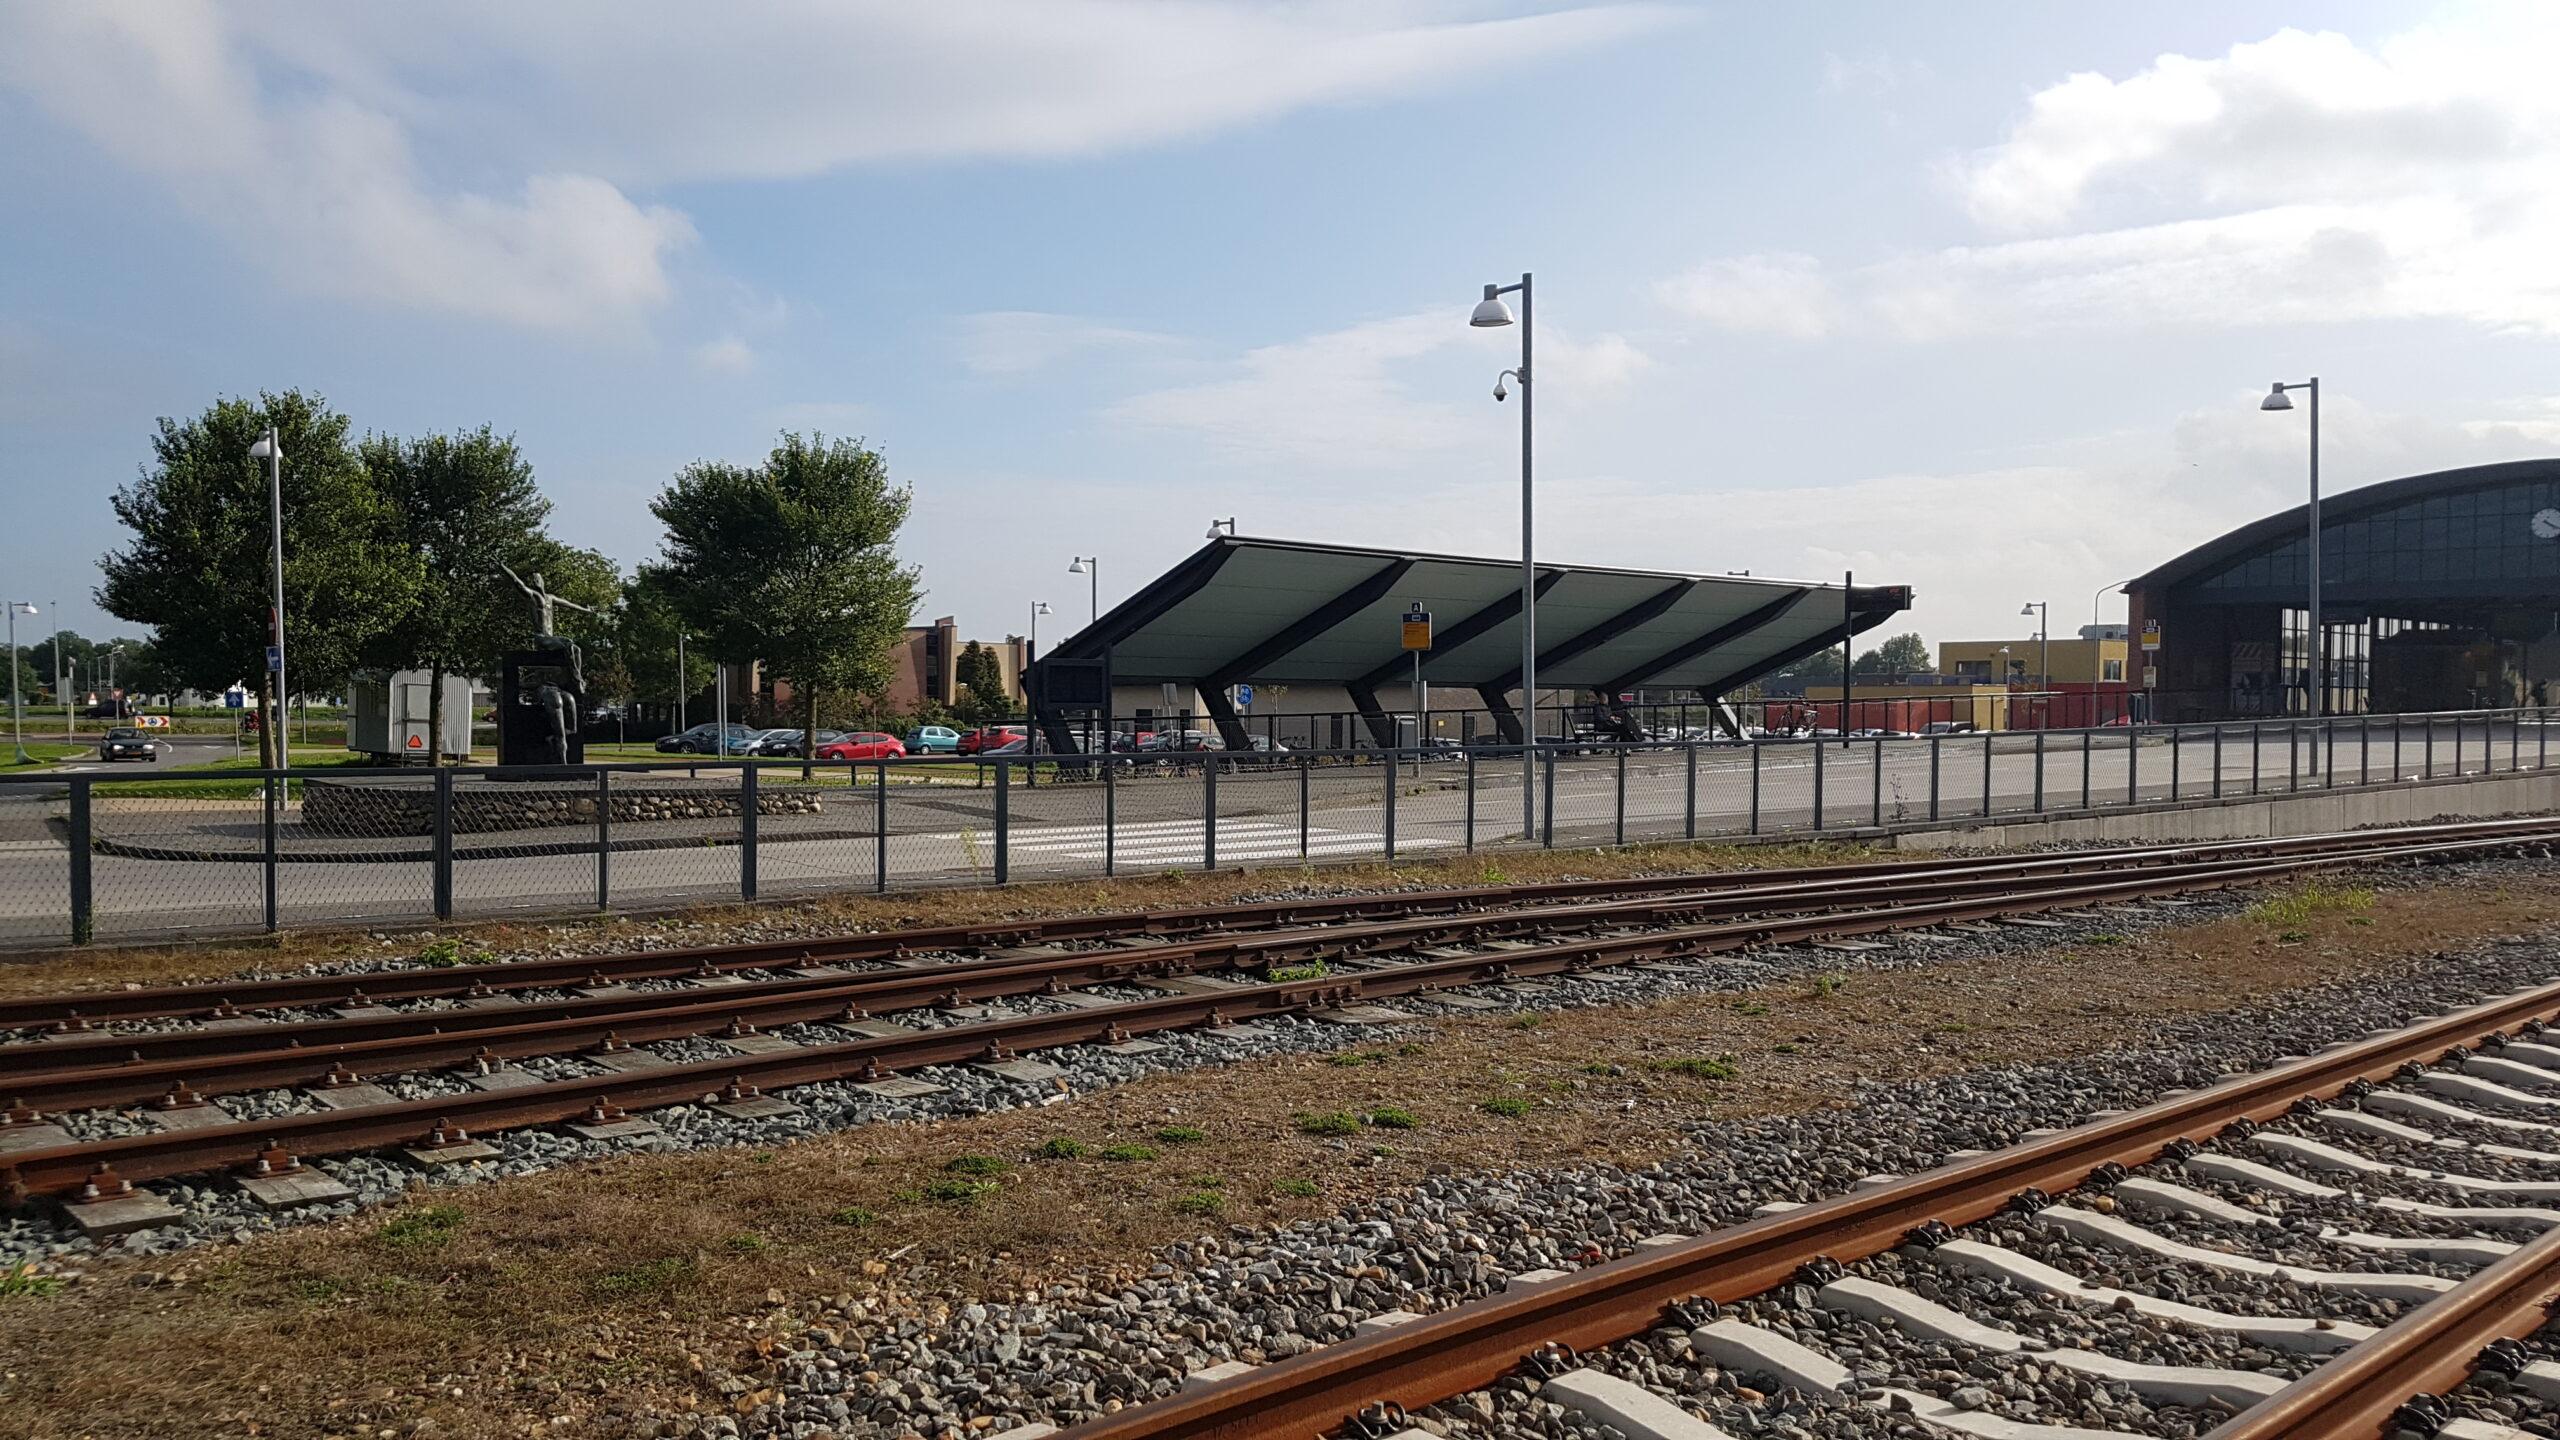 20200930_Busstation2